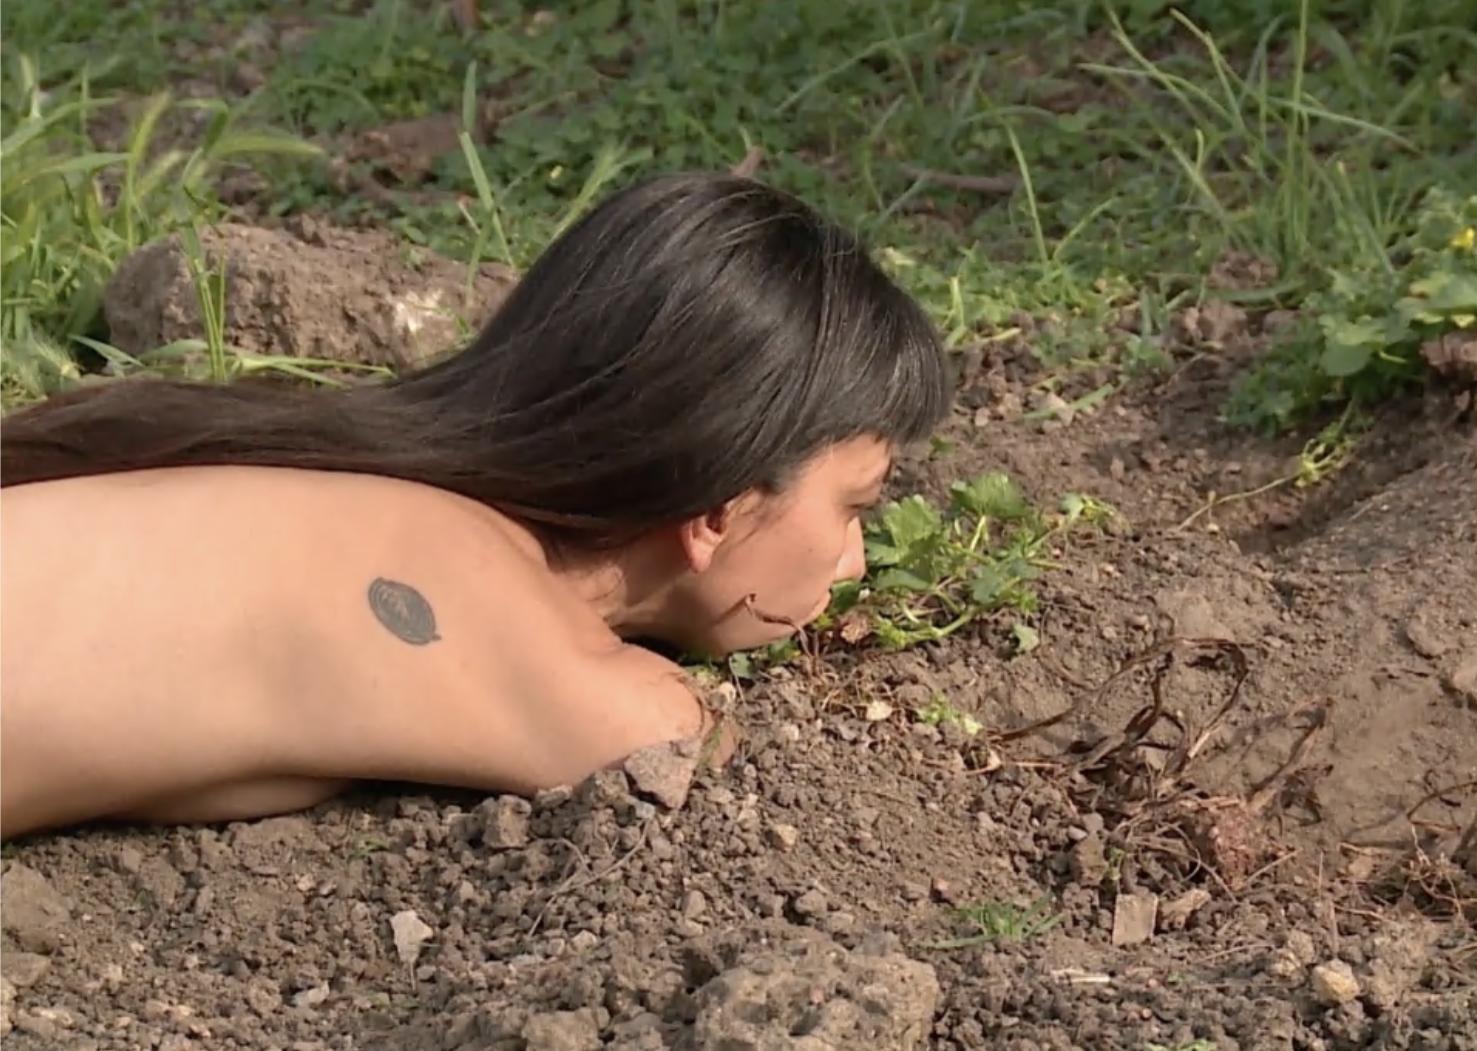 Regina José Galindo 'Raices' (video still) 2015